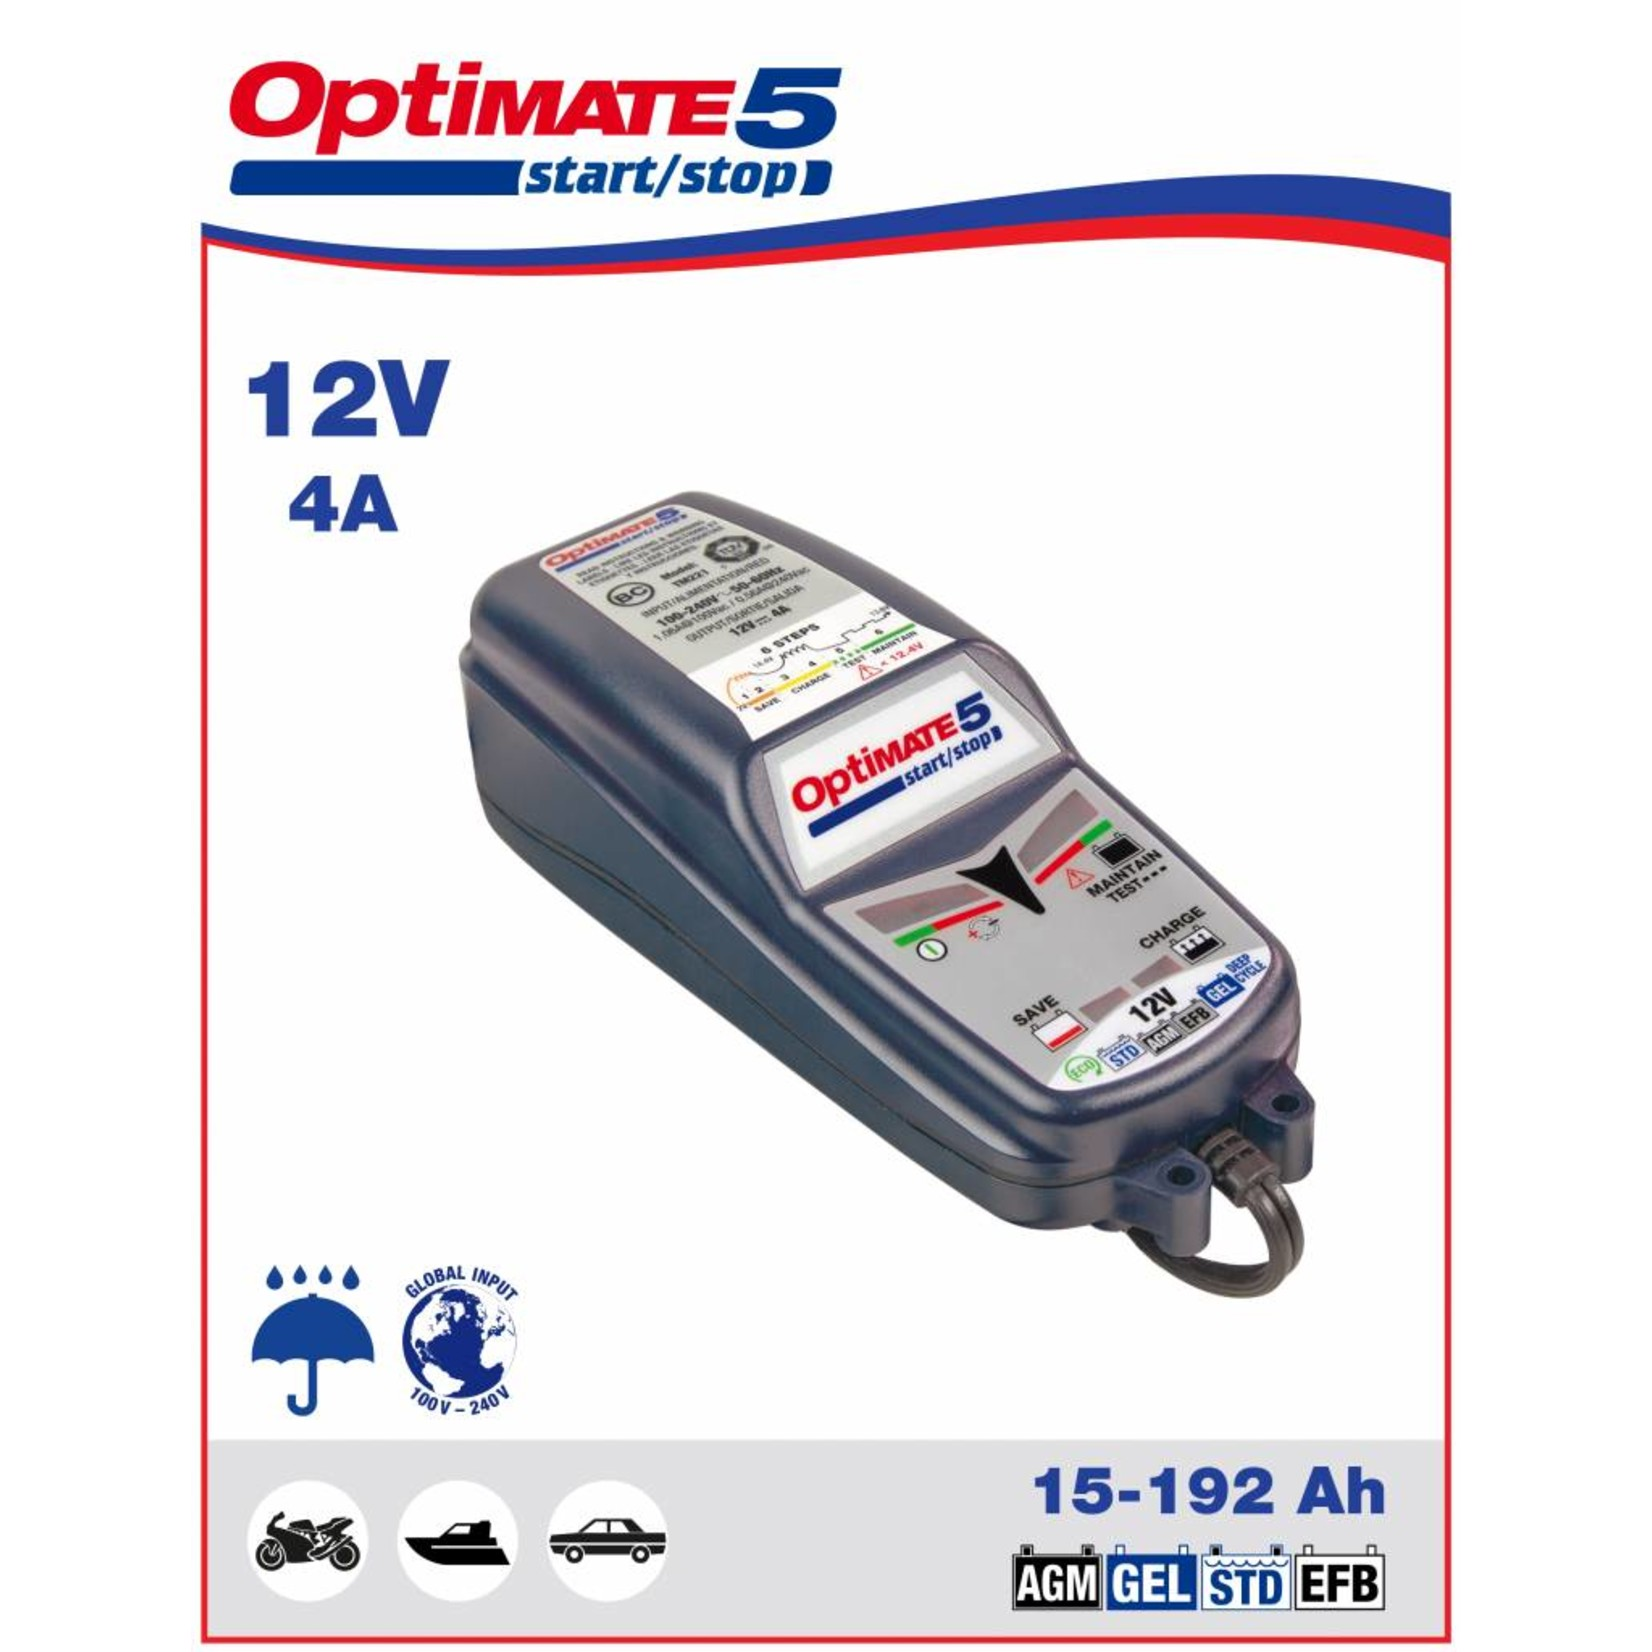 OptiMate OptiMate 5 - Battery Charger start/stop 12V